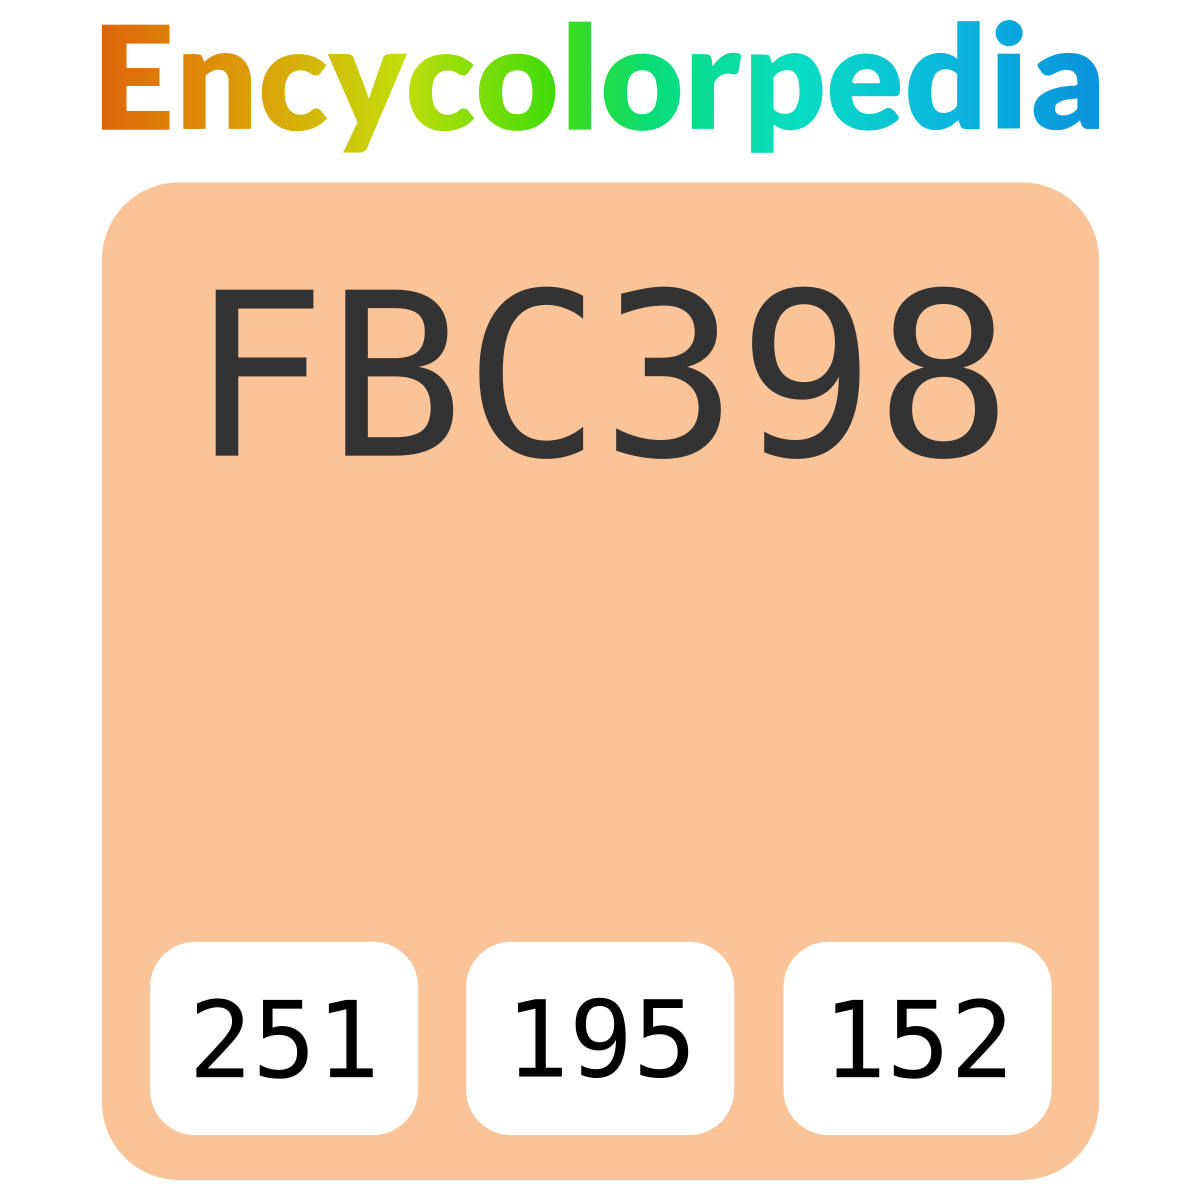 Amber Berger Nude pratt & lambert nude rose 7-5 / #fbc398 hex color code